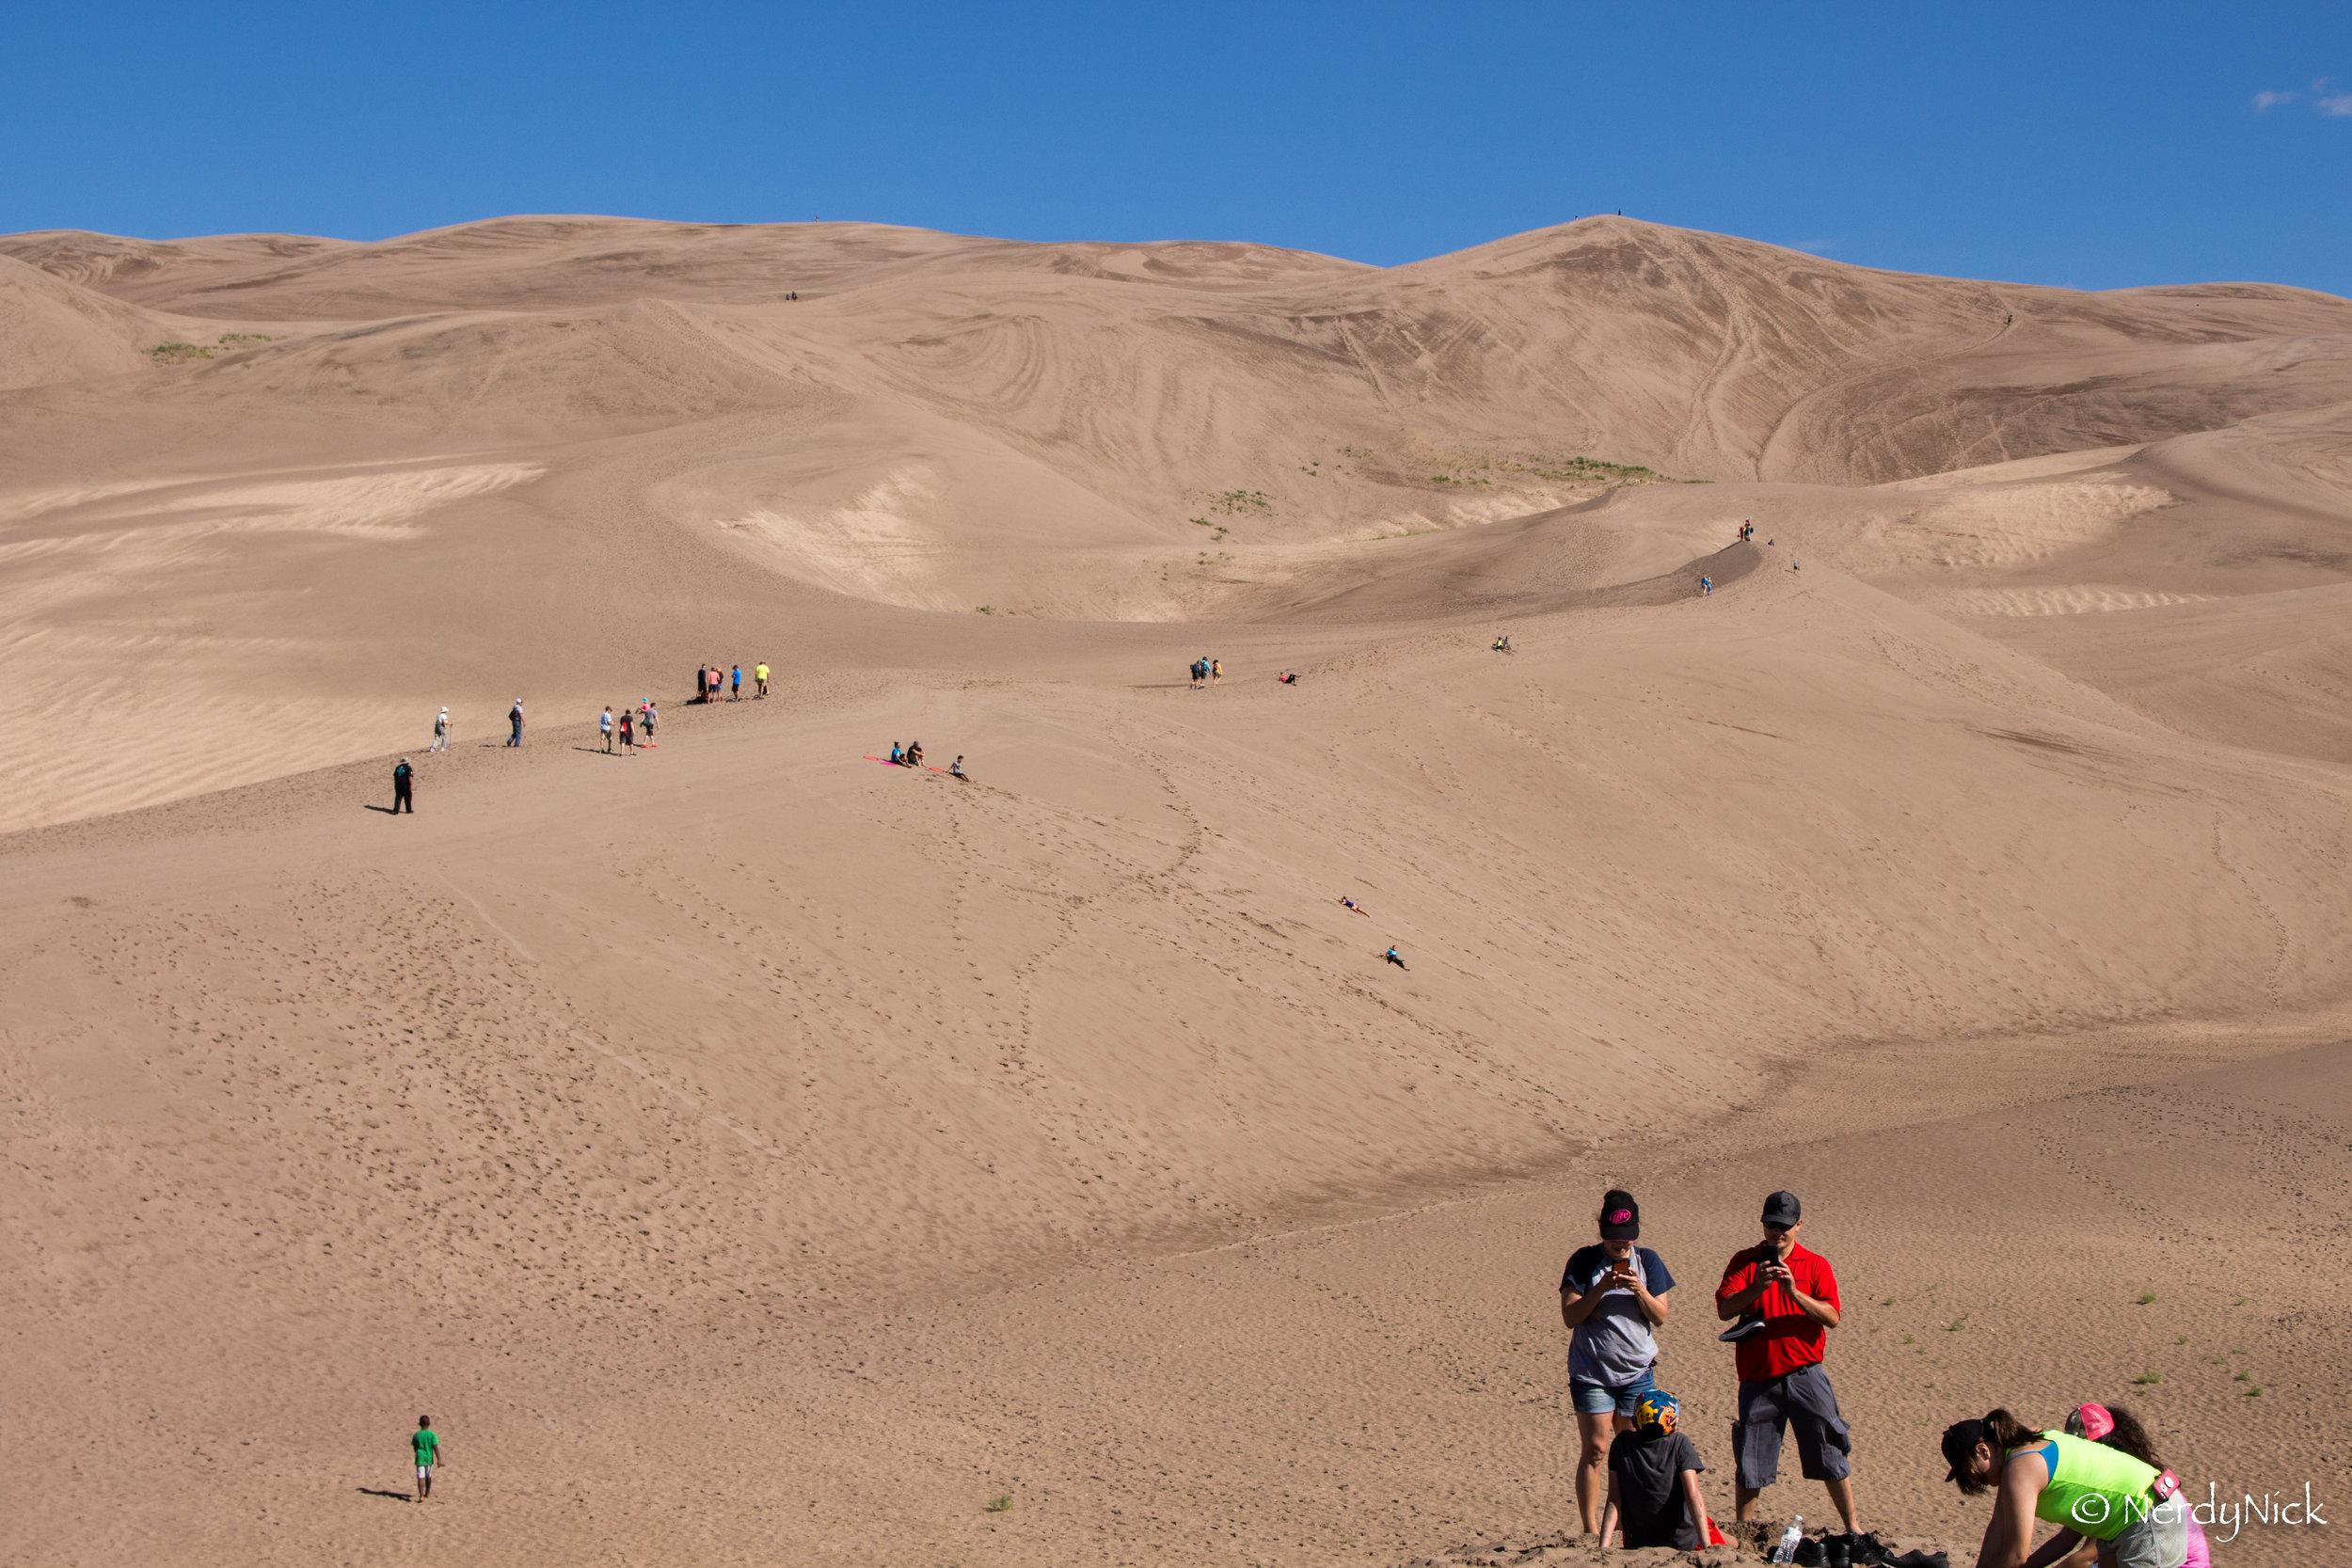 Sledding on the dunes